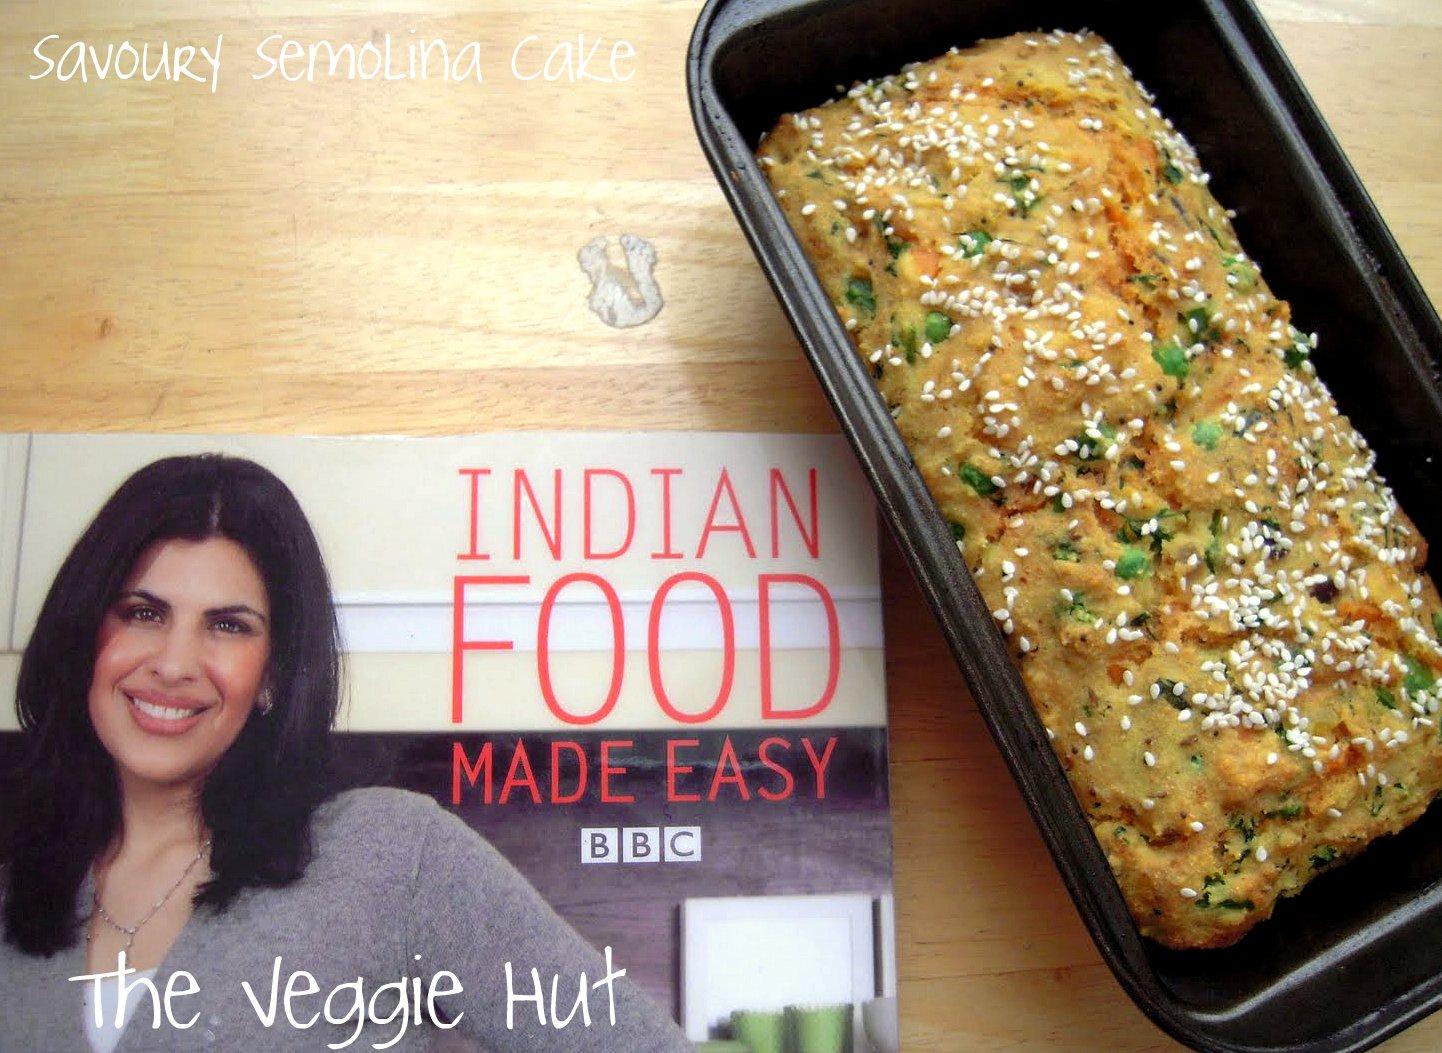 The veggie hut savoury semolina cake savoury semolina cake i tried this recipe from anjum anands book indian food made easy forumfinder Images